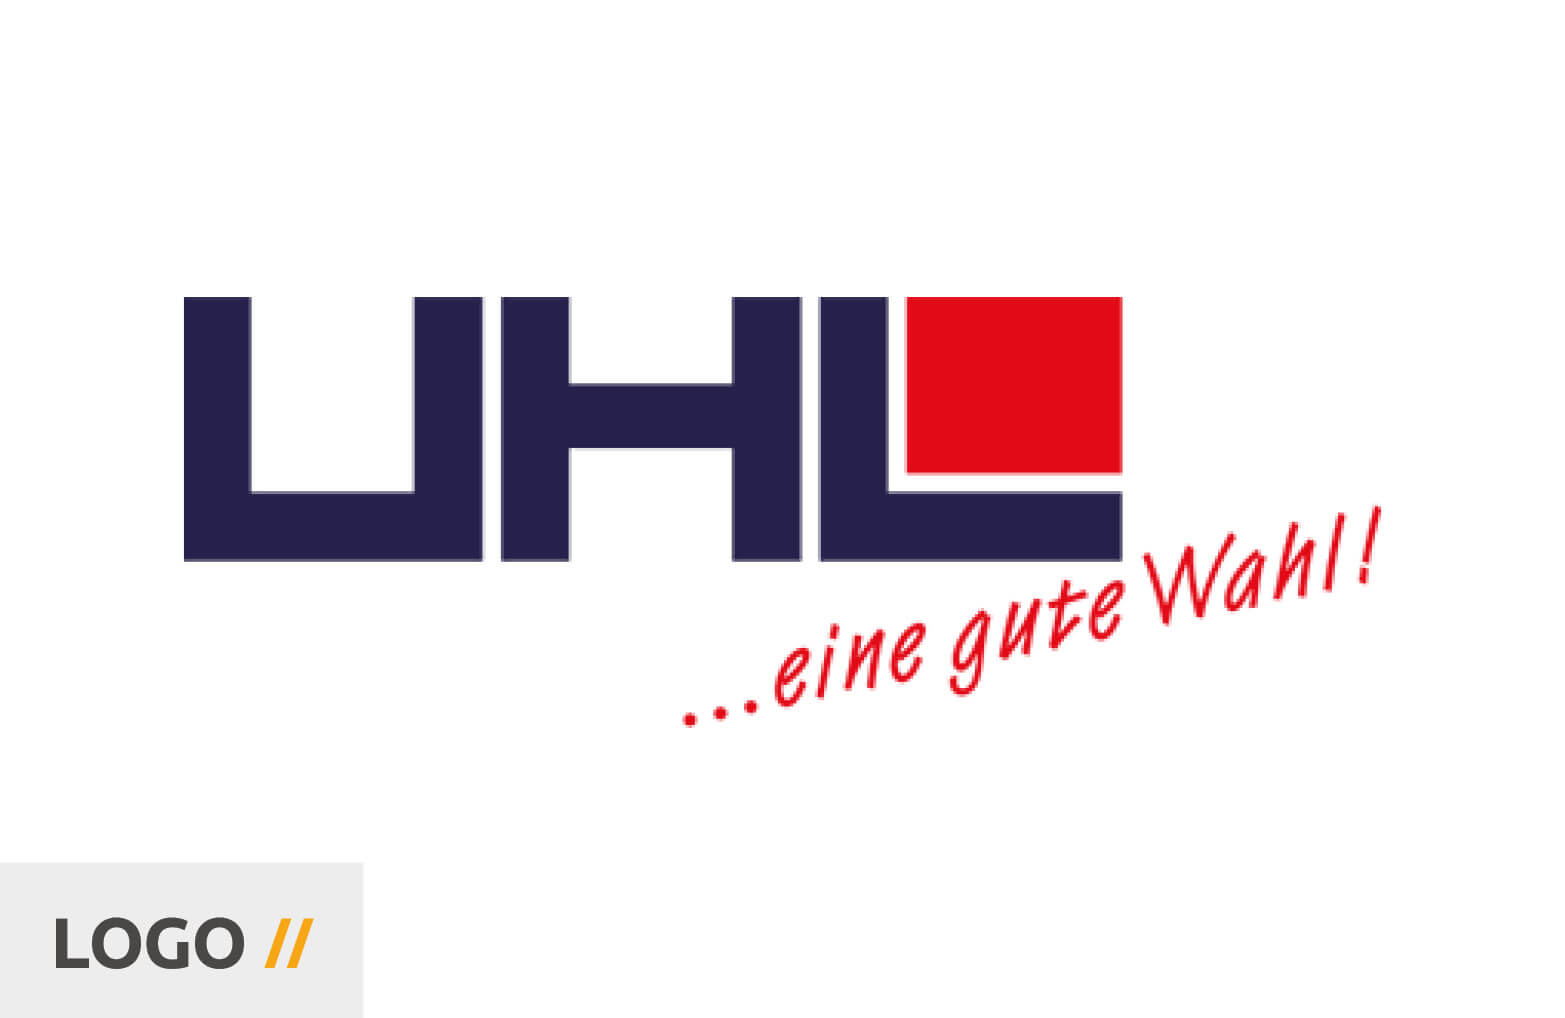 uhl_relaunch_1565x1018_alt_1